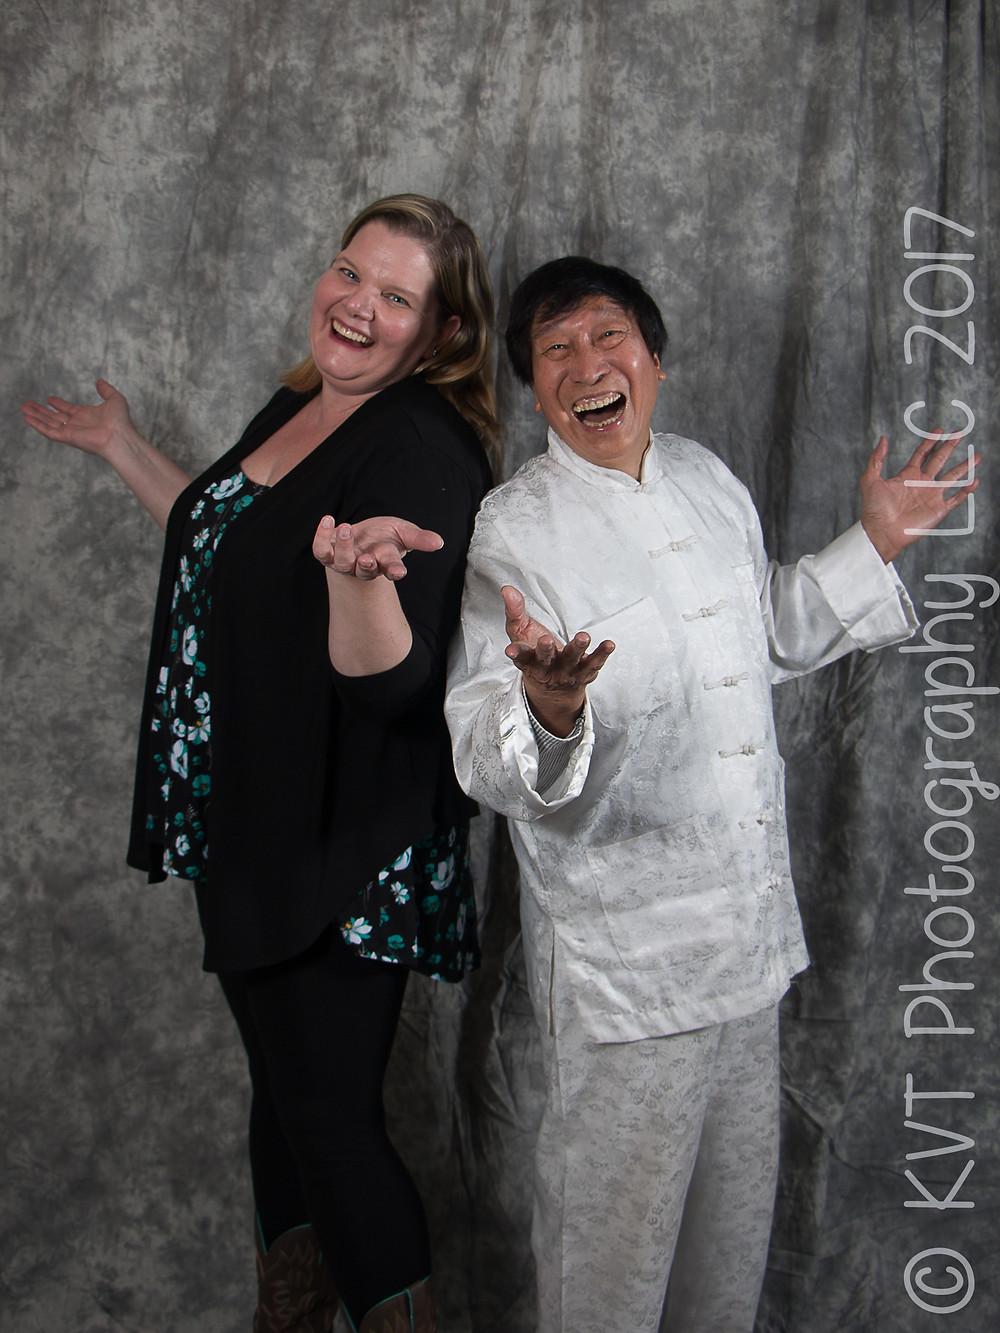 Me and Grandmaster Chi Ling Chiu having a laugh